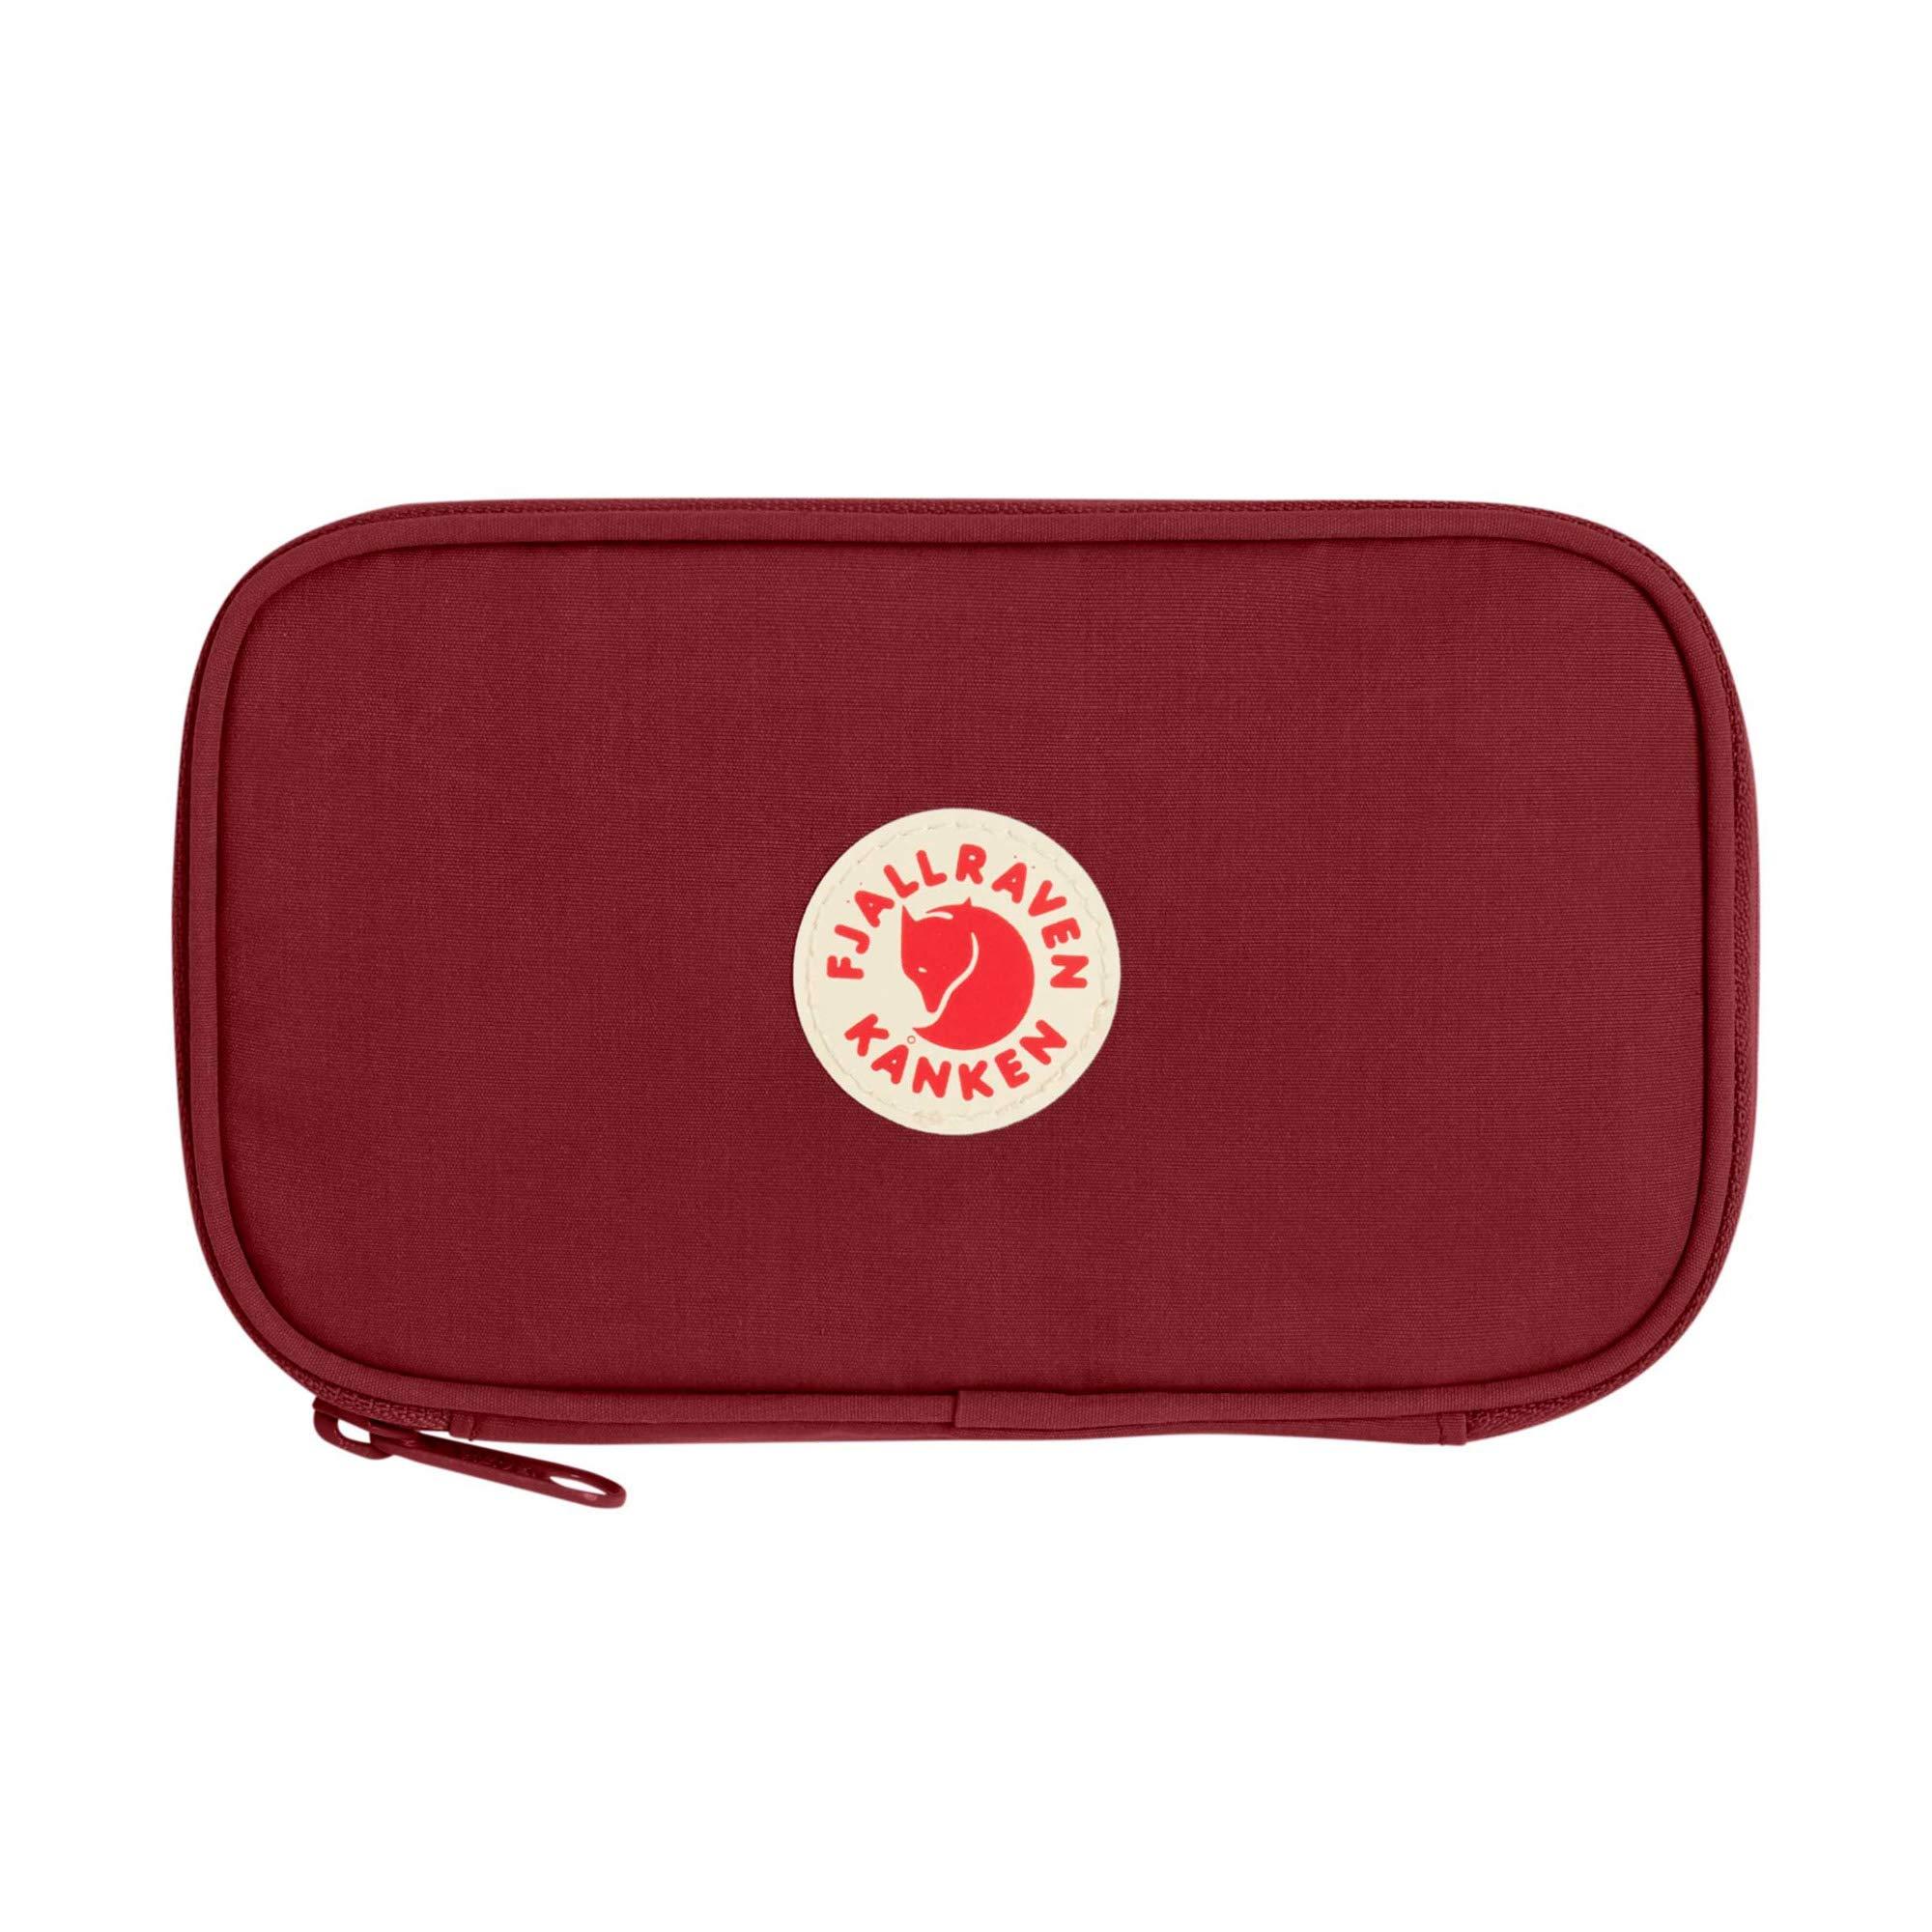 Fjallraven - Kanken Travel Wallet for Passports, Ox Red by Fjallraven